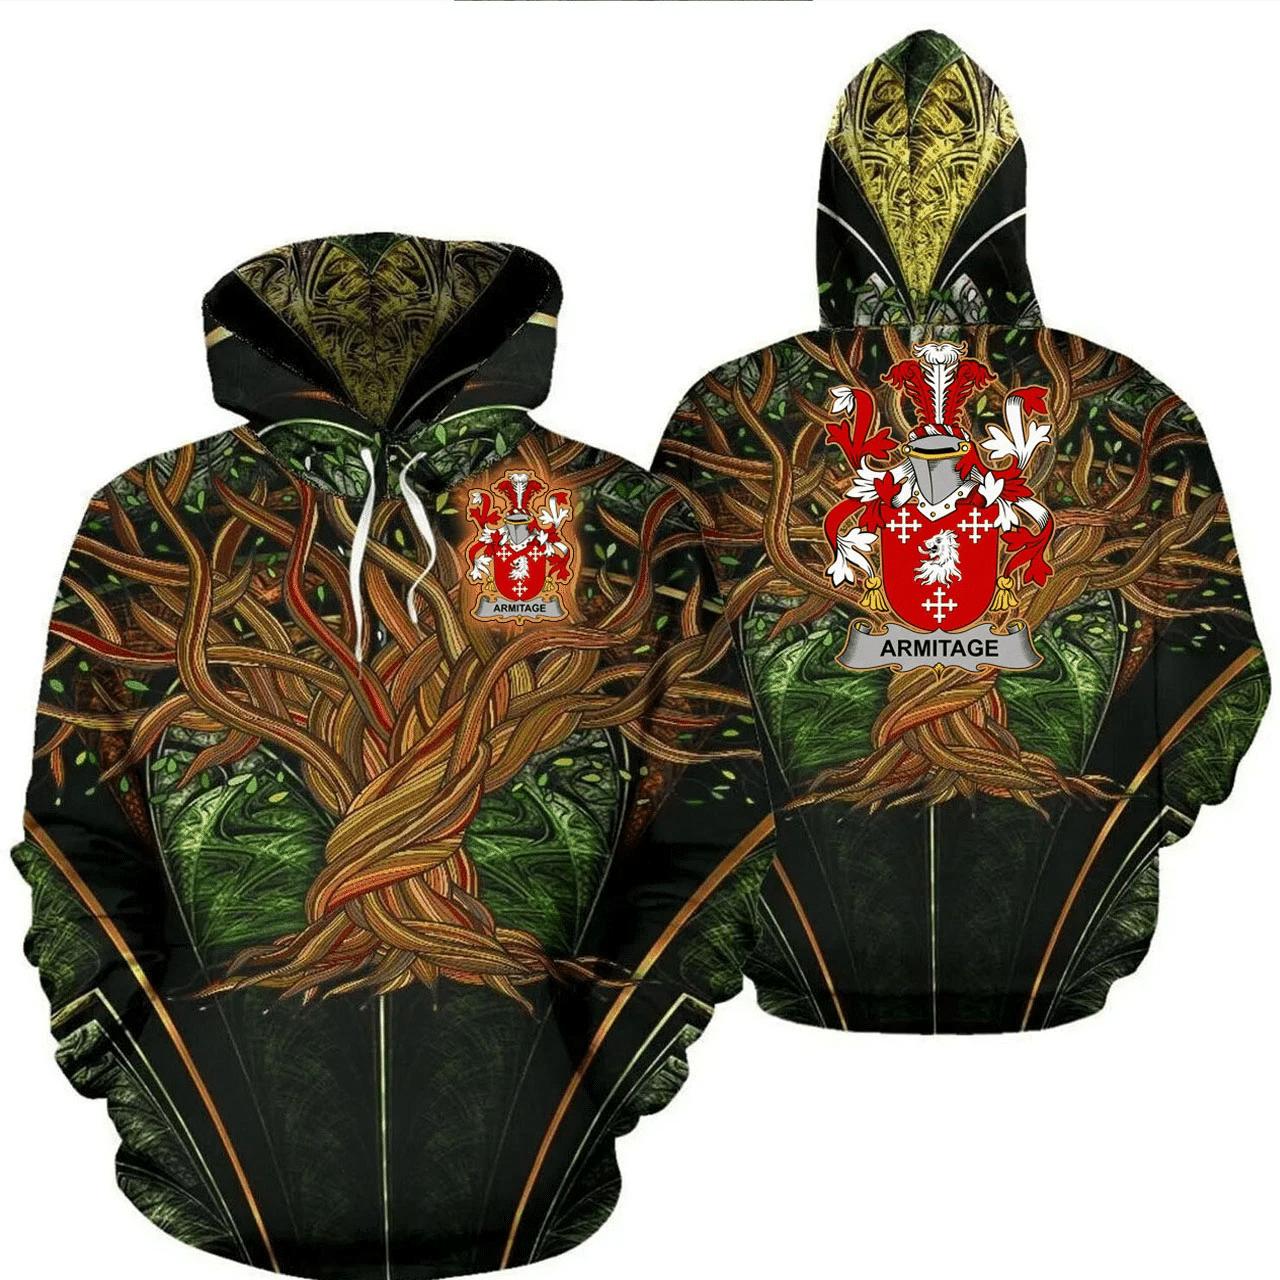 1stIreland Ireland Hoodie - Armitage Irish Family Crest Hoodie - Tree Of Life A7